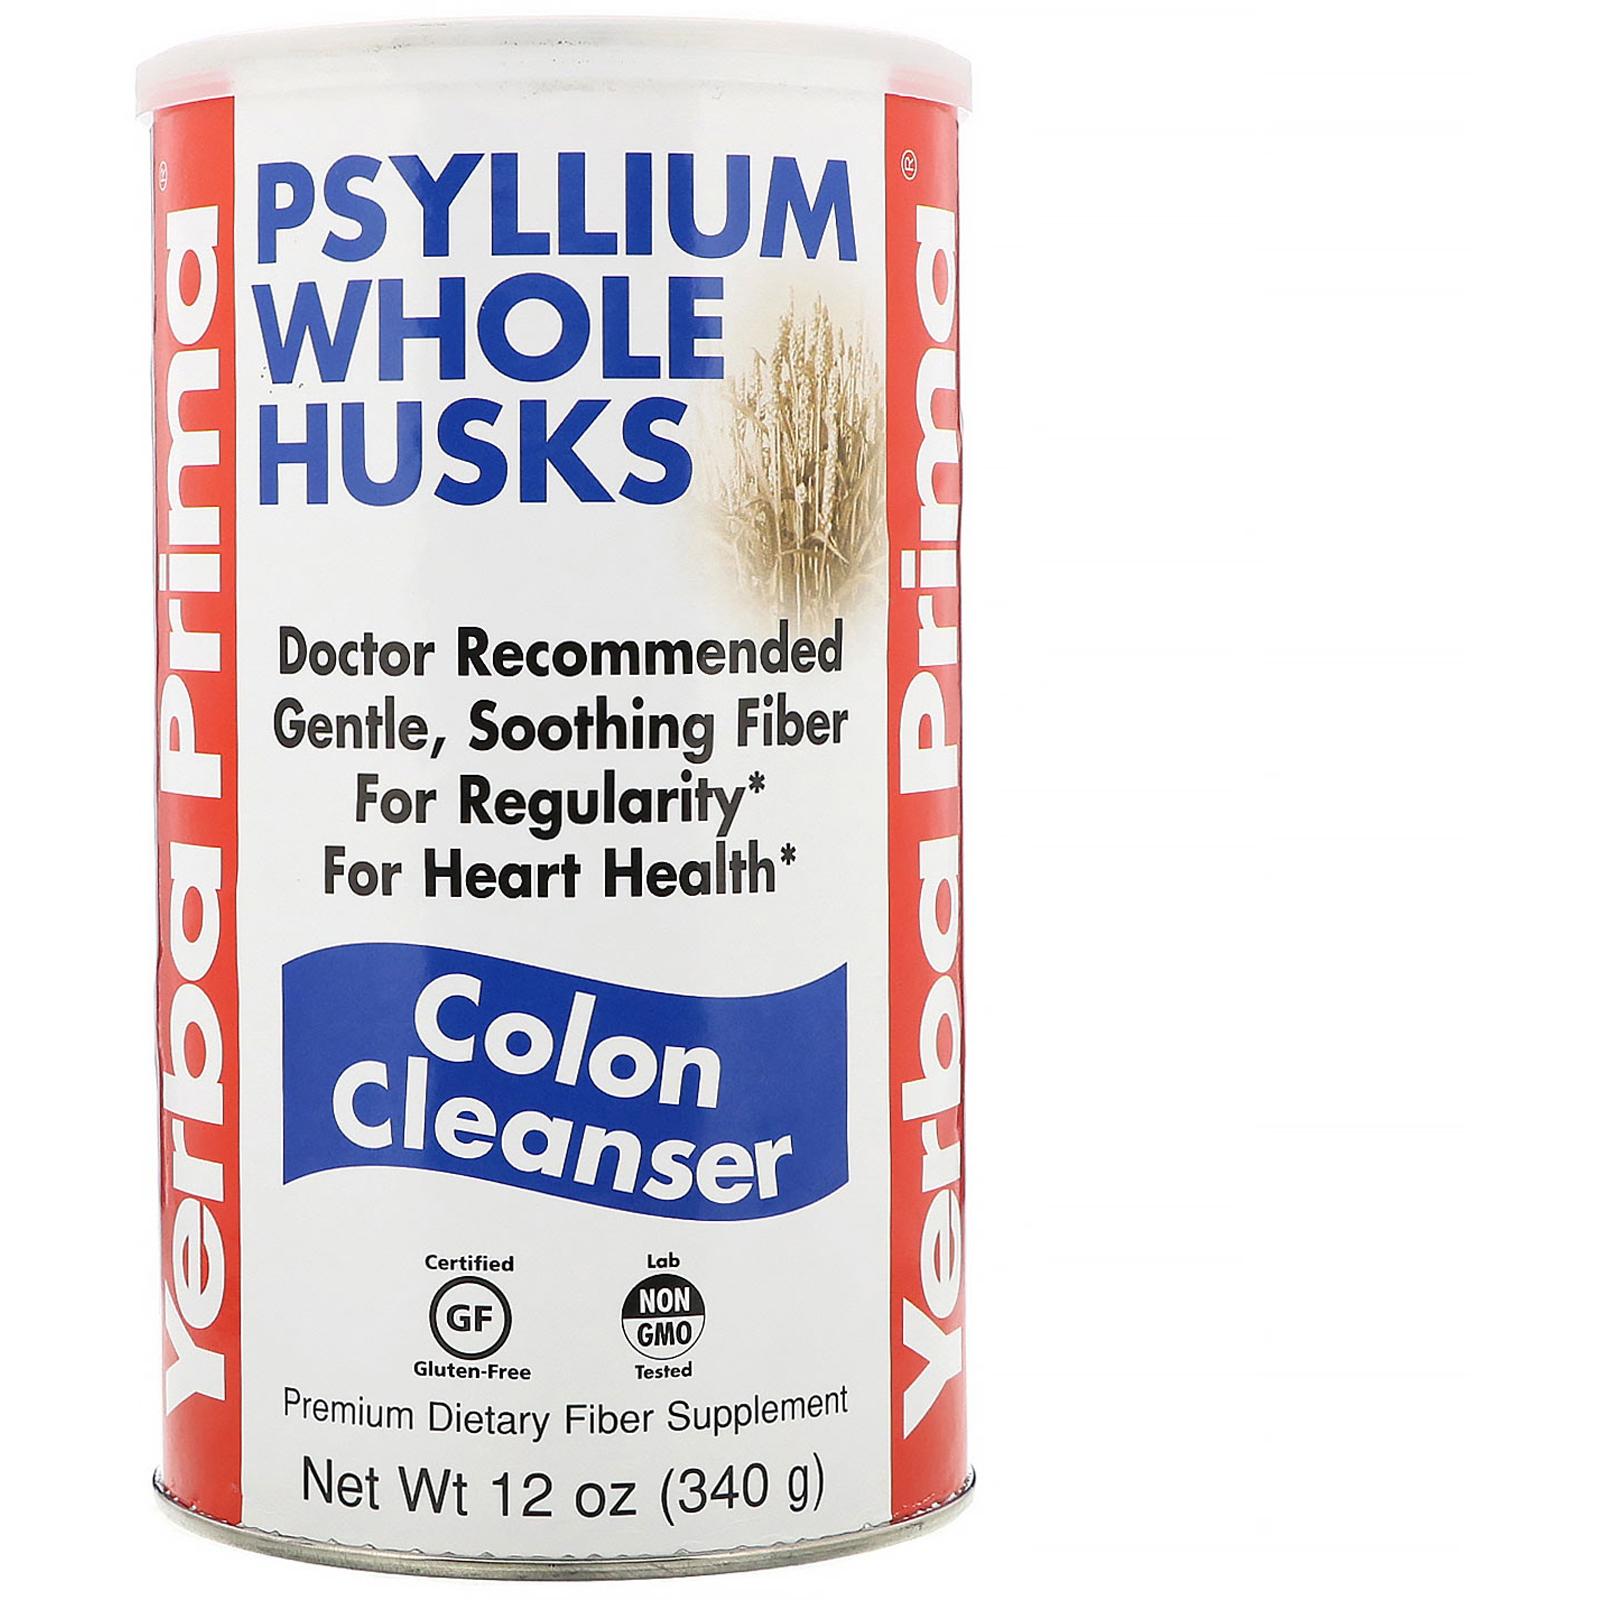 Yerba Prima, Psyllium Whole Husks, Colon Cleanser, 12 oz